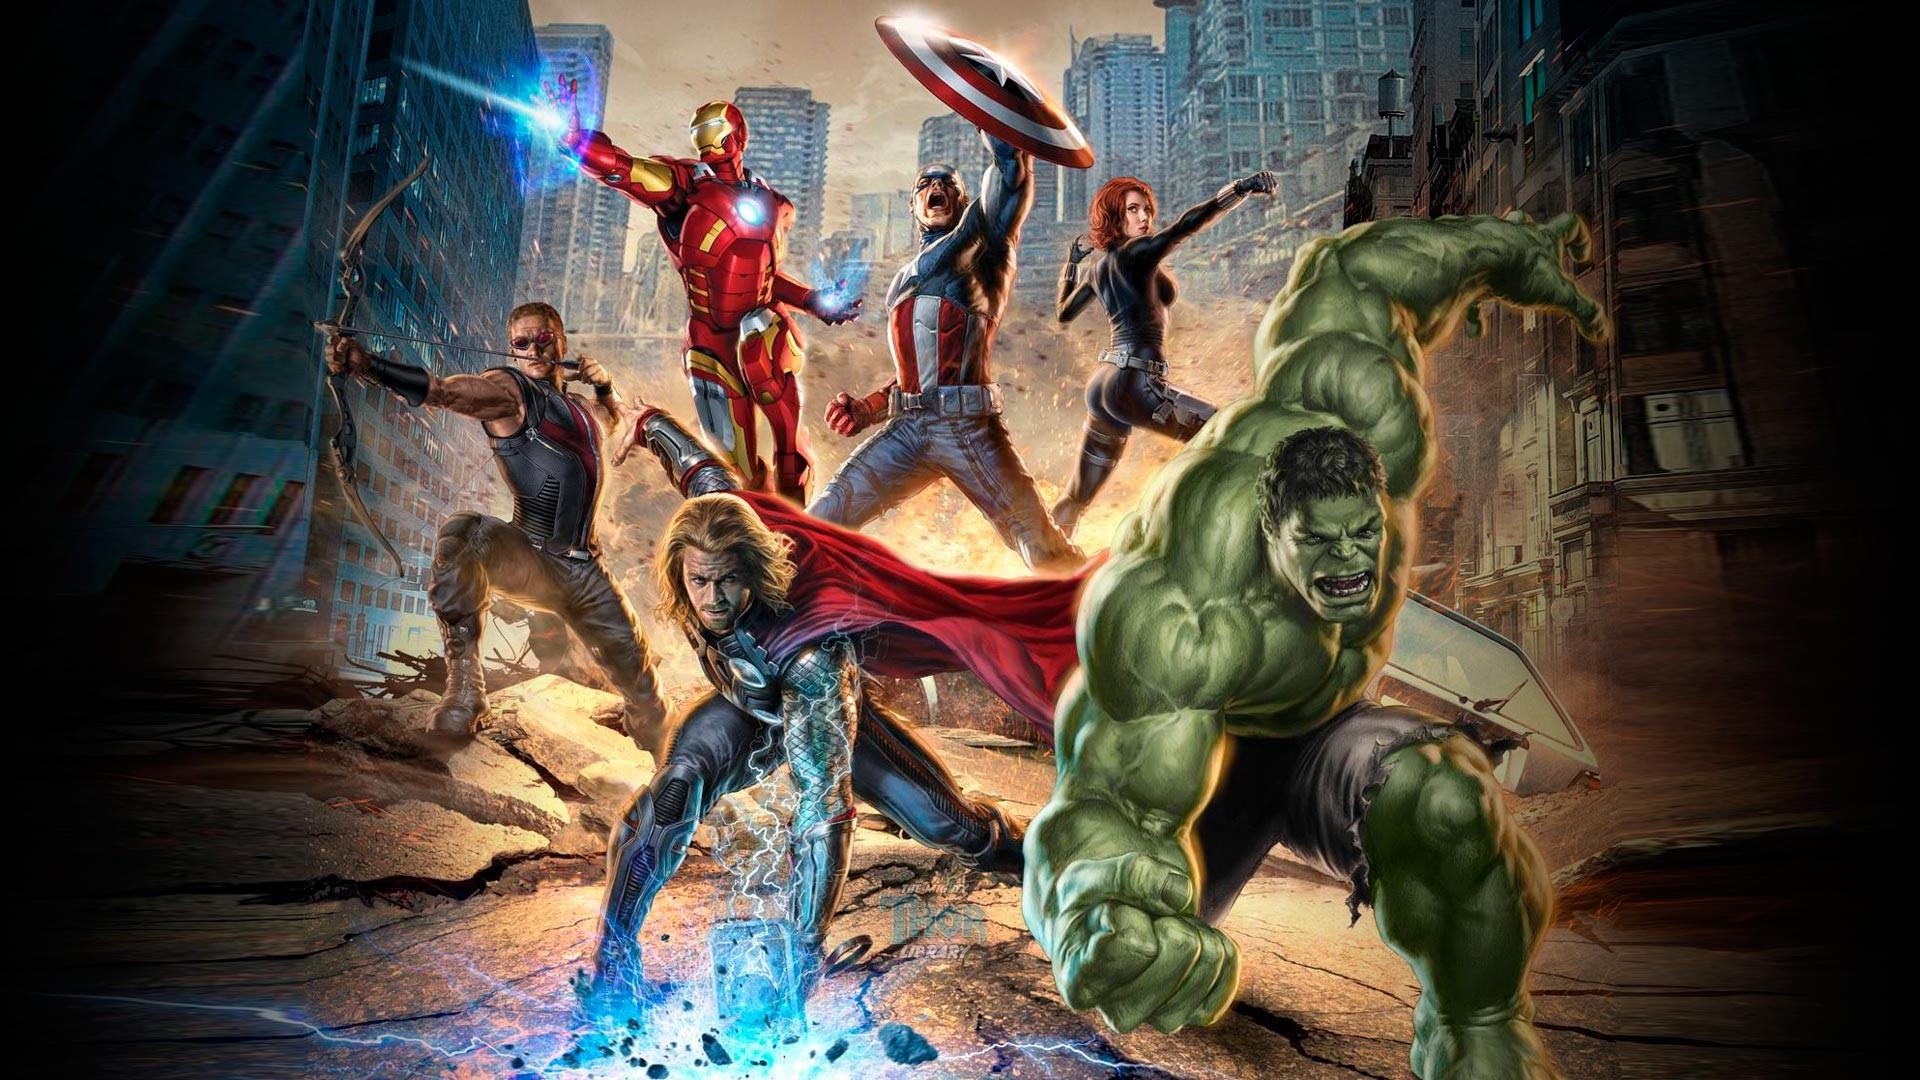 Avengers Movie Wallpaper (1920 x 1080) wallpaper